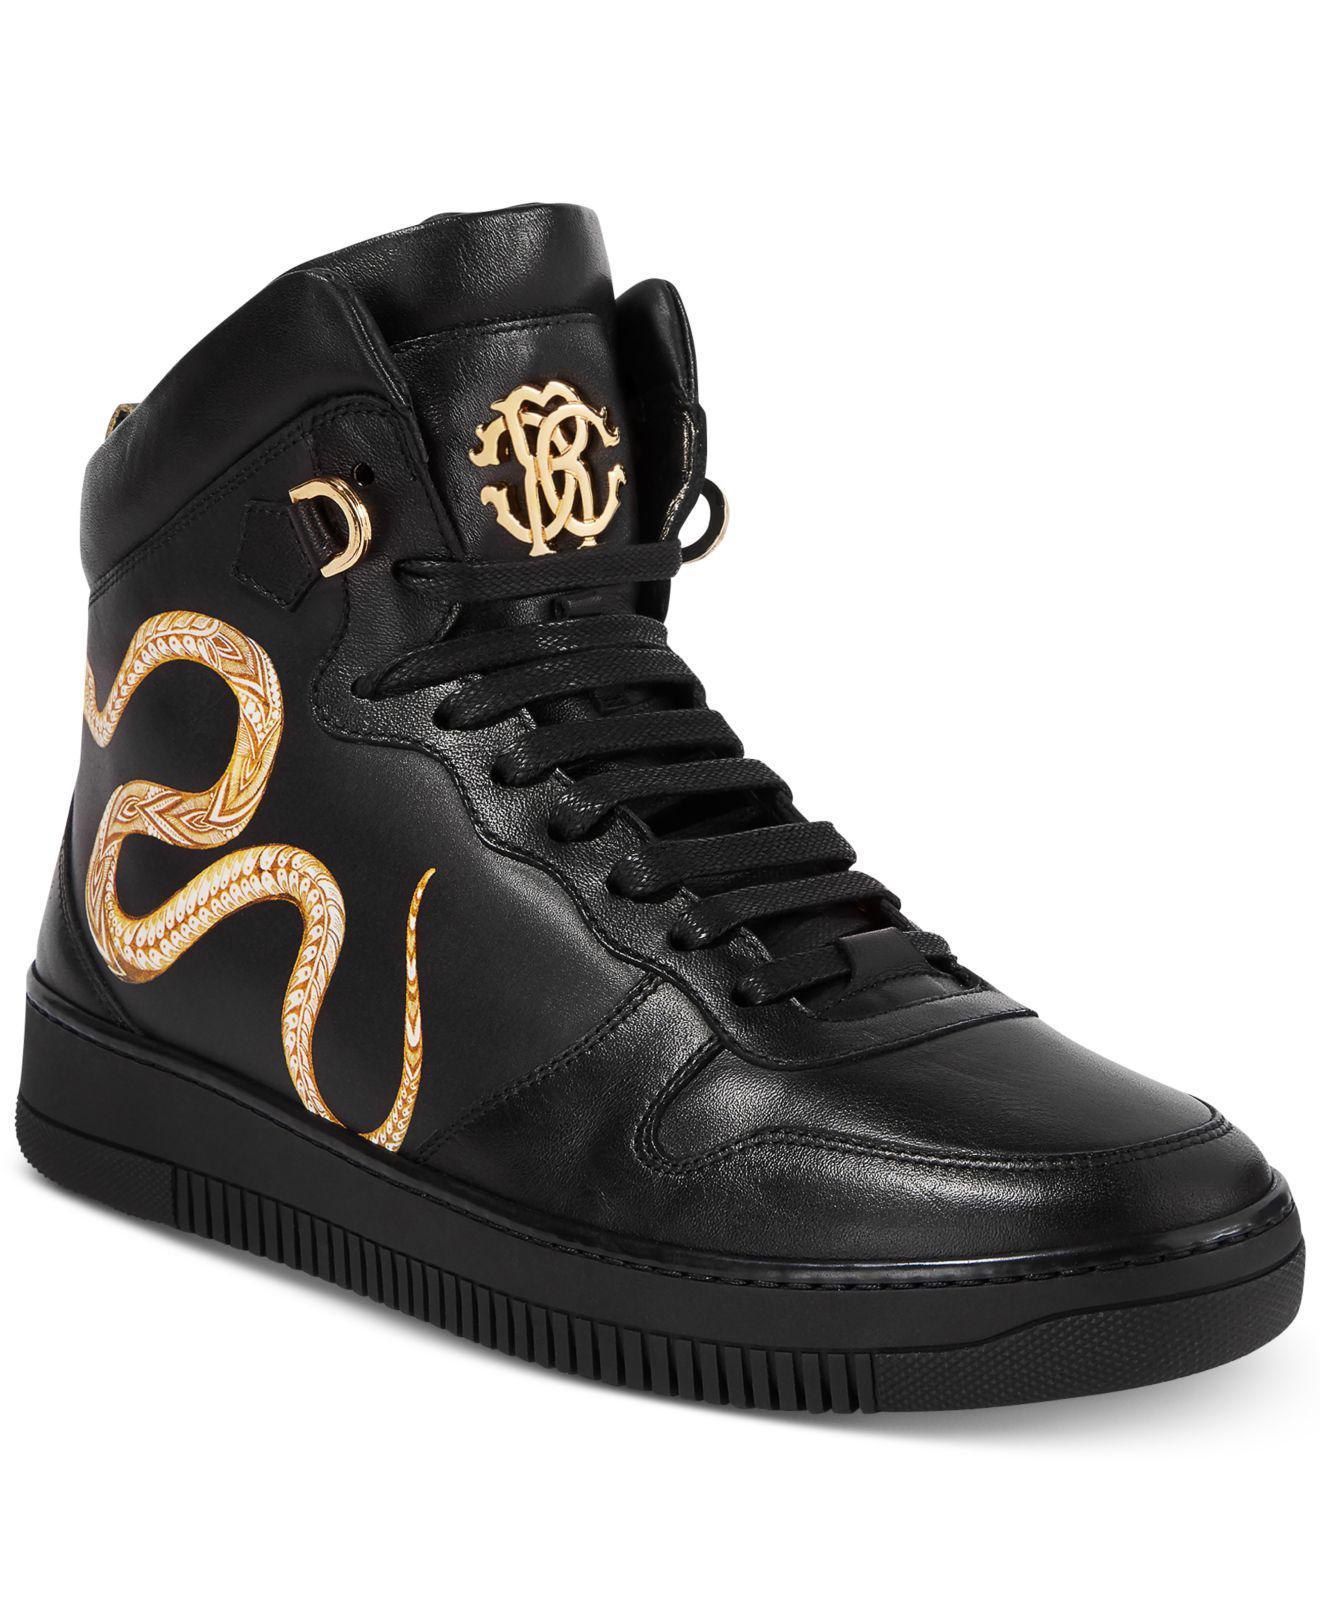 3730479fba5 Roberto Cavalli Black Men's Leather Gold Hightop Sneakers for men